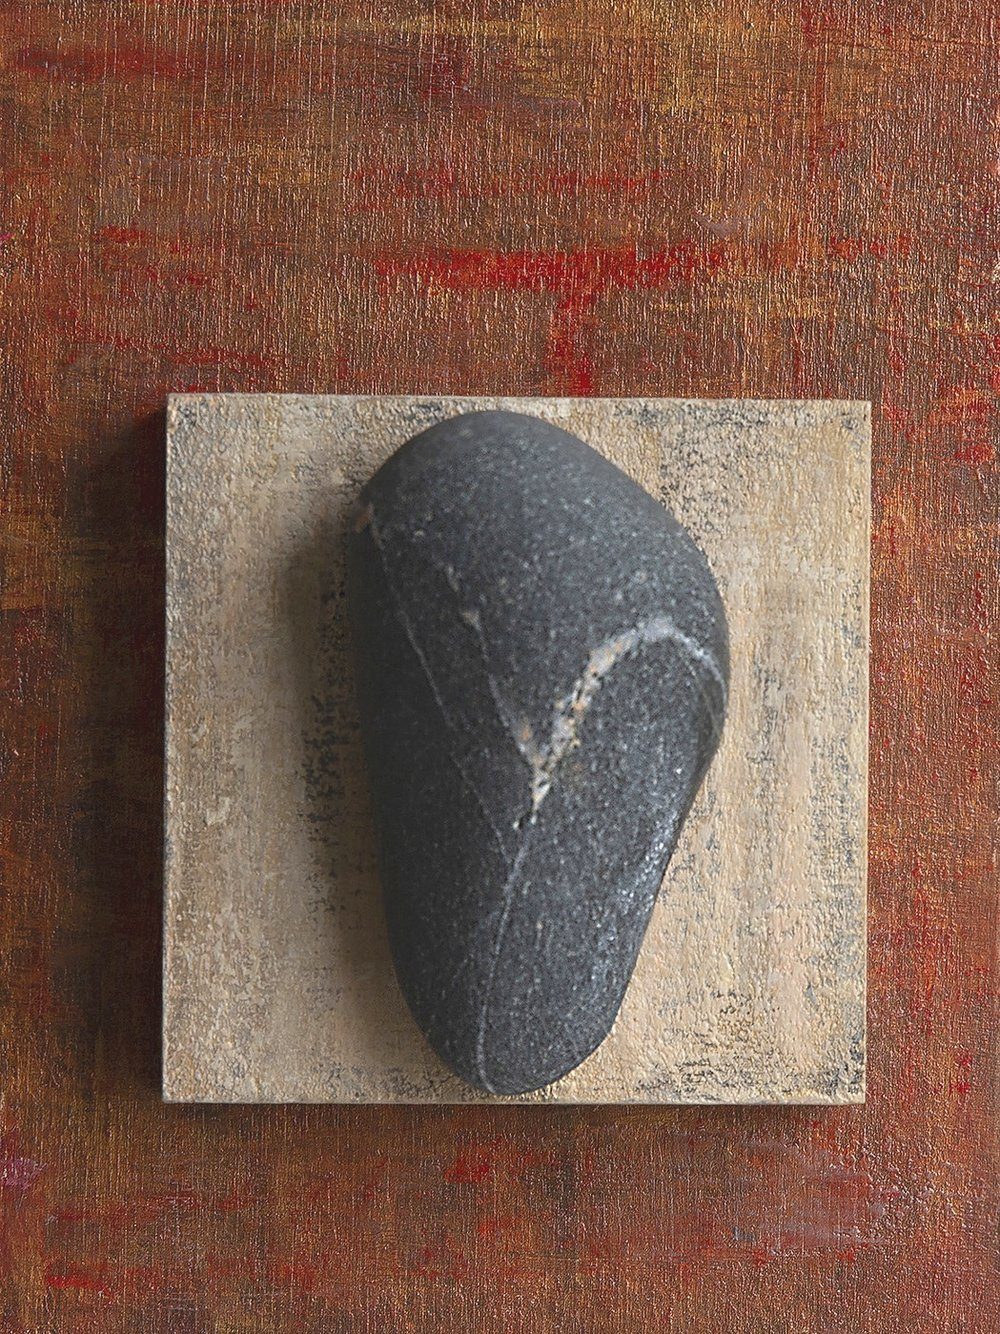 Marilyn_Grad_Natural_Elements_Zen_Rock_Red_6x8_1.jpg-web.jpg-1400px.JPG